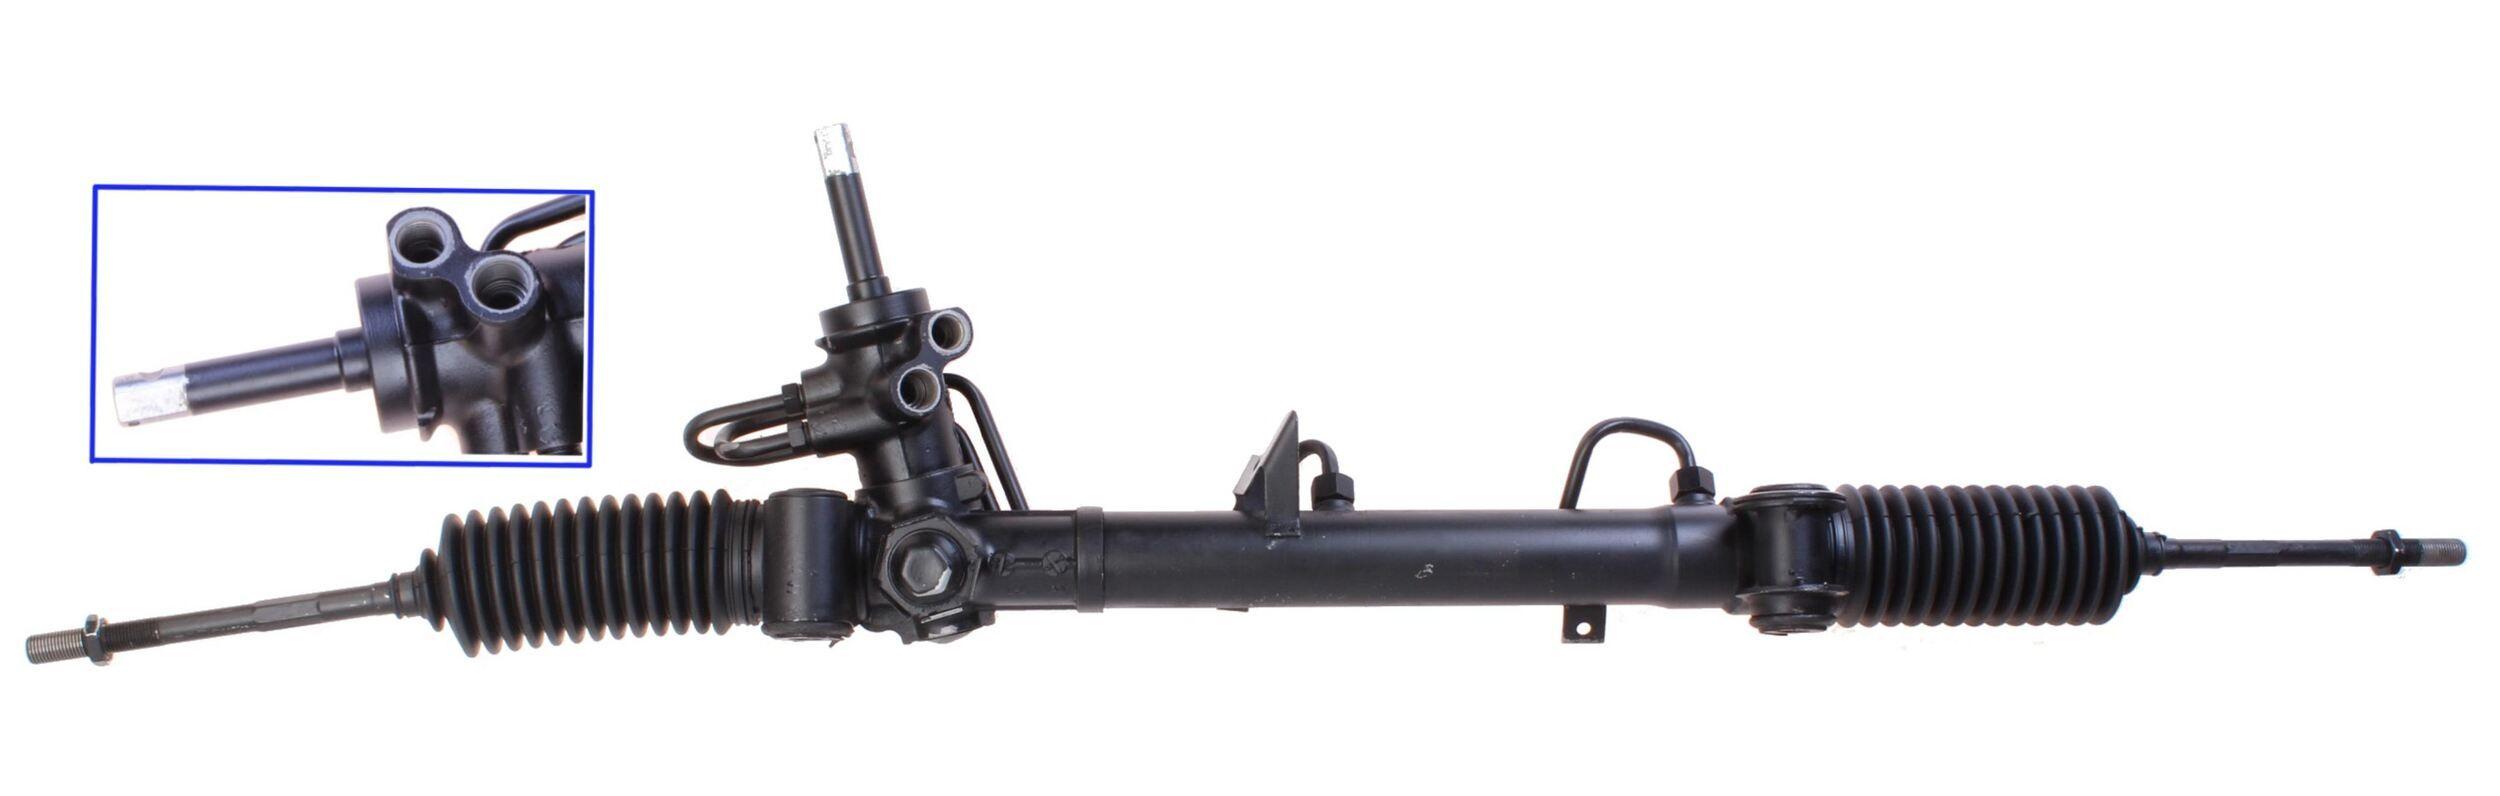 OPEL ZAFIRA 2014 Lenkgetriebe - Original ELSTOCK 11-0262